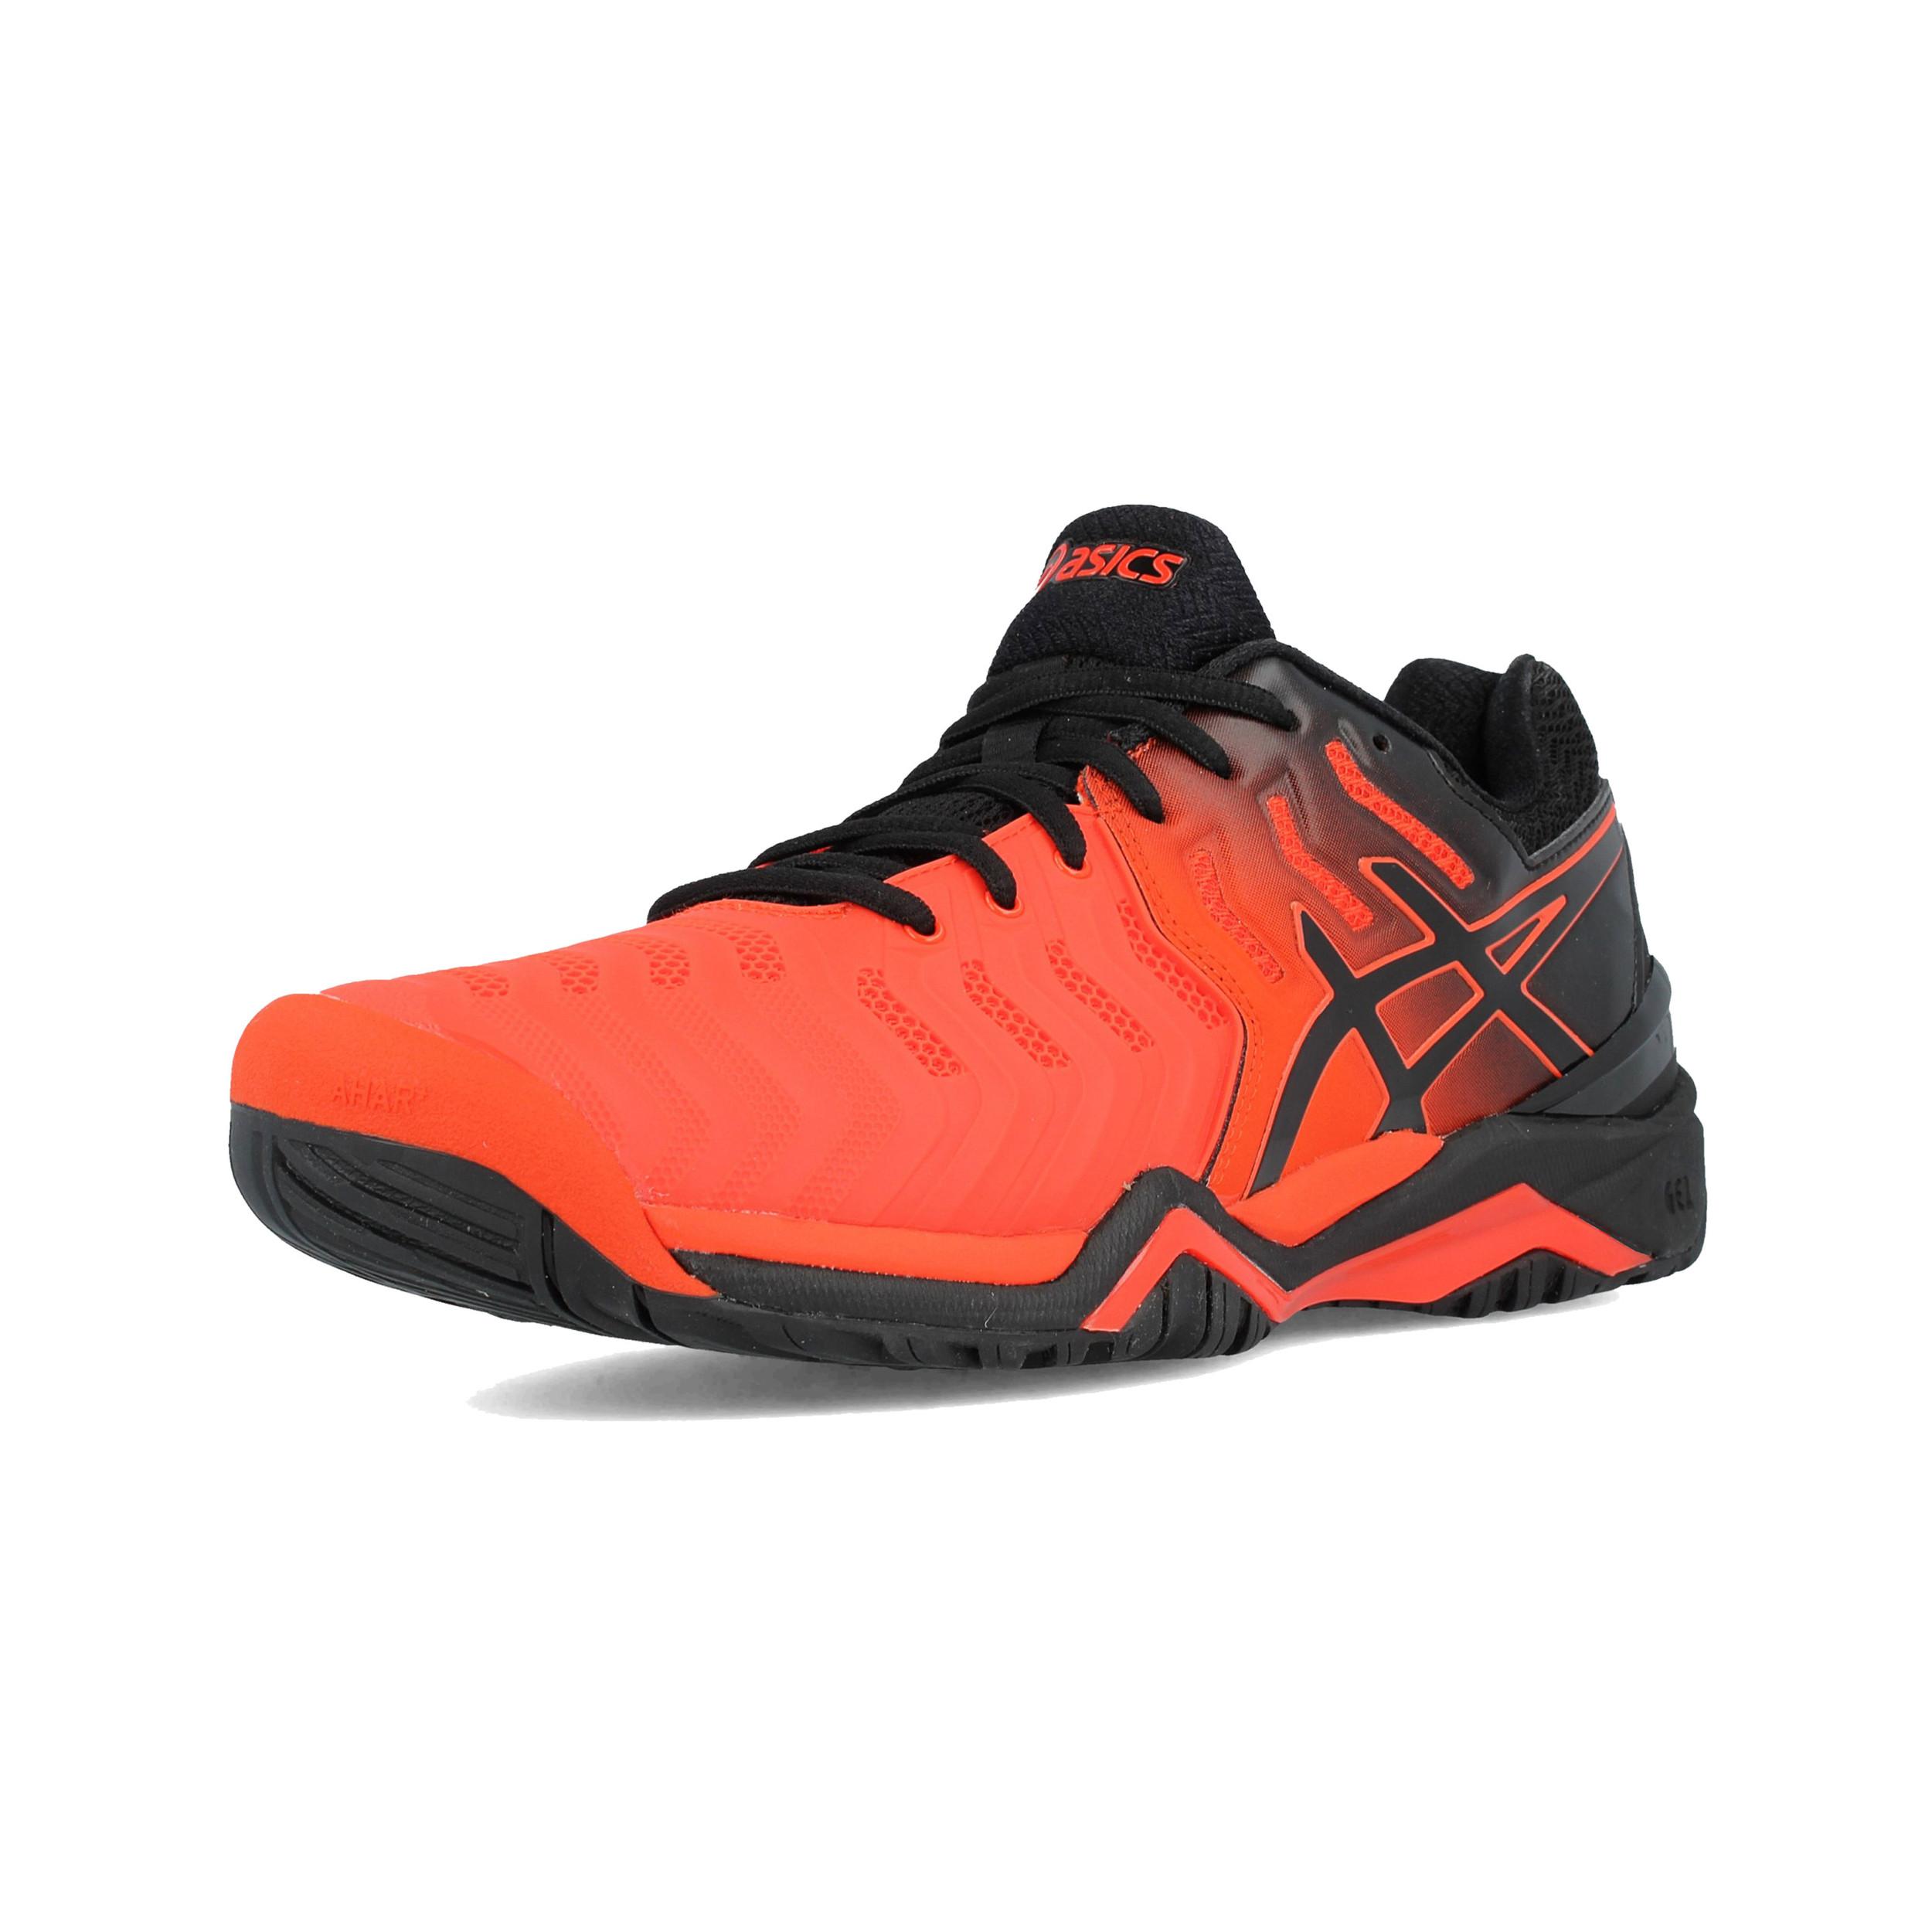 6bd241b97a2 Asics Hombre Gel-resolution 7 Tenis Zapatos Negro Rojo Deporte Transpirable